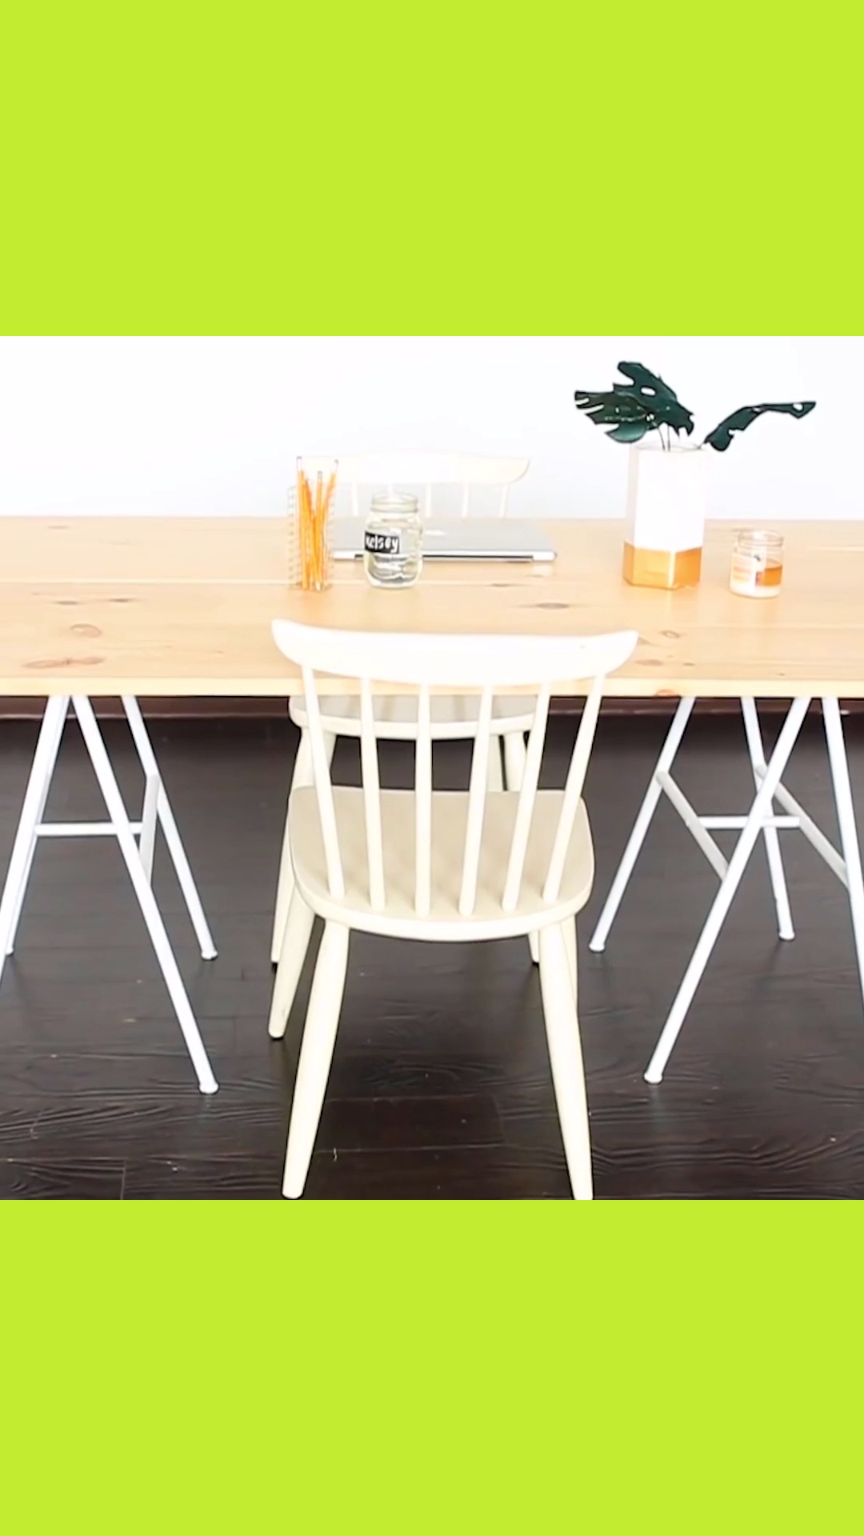 Diy modern plank table wood furniture diy pinterest home decor